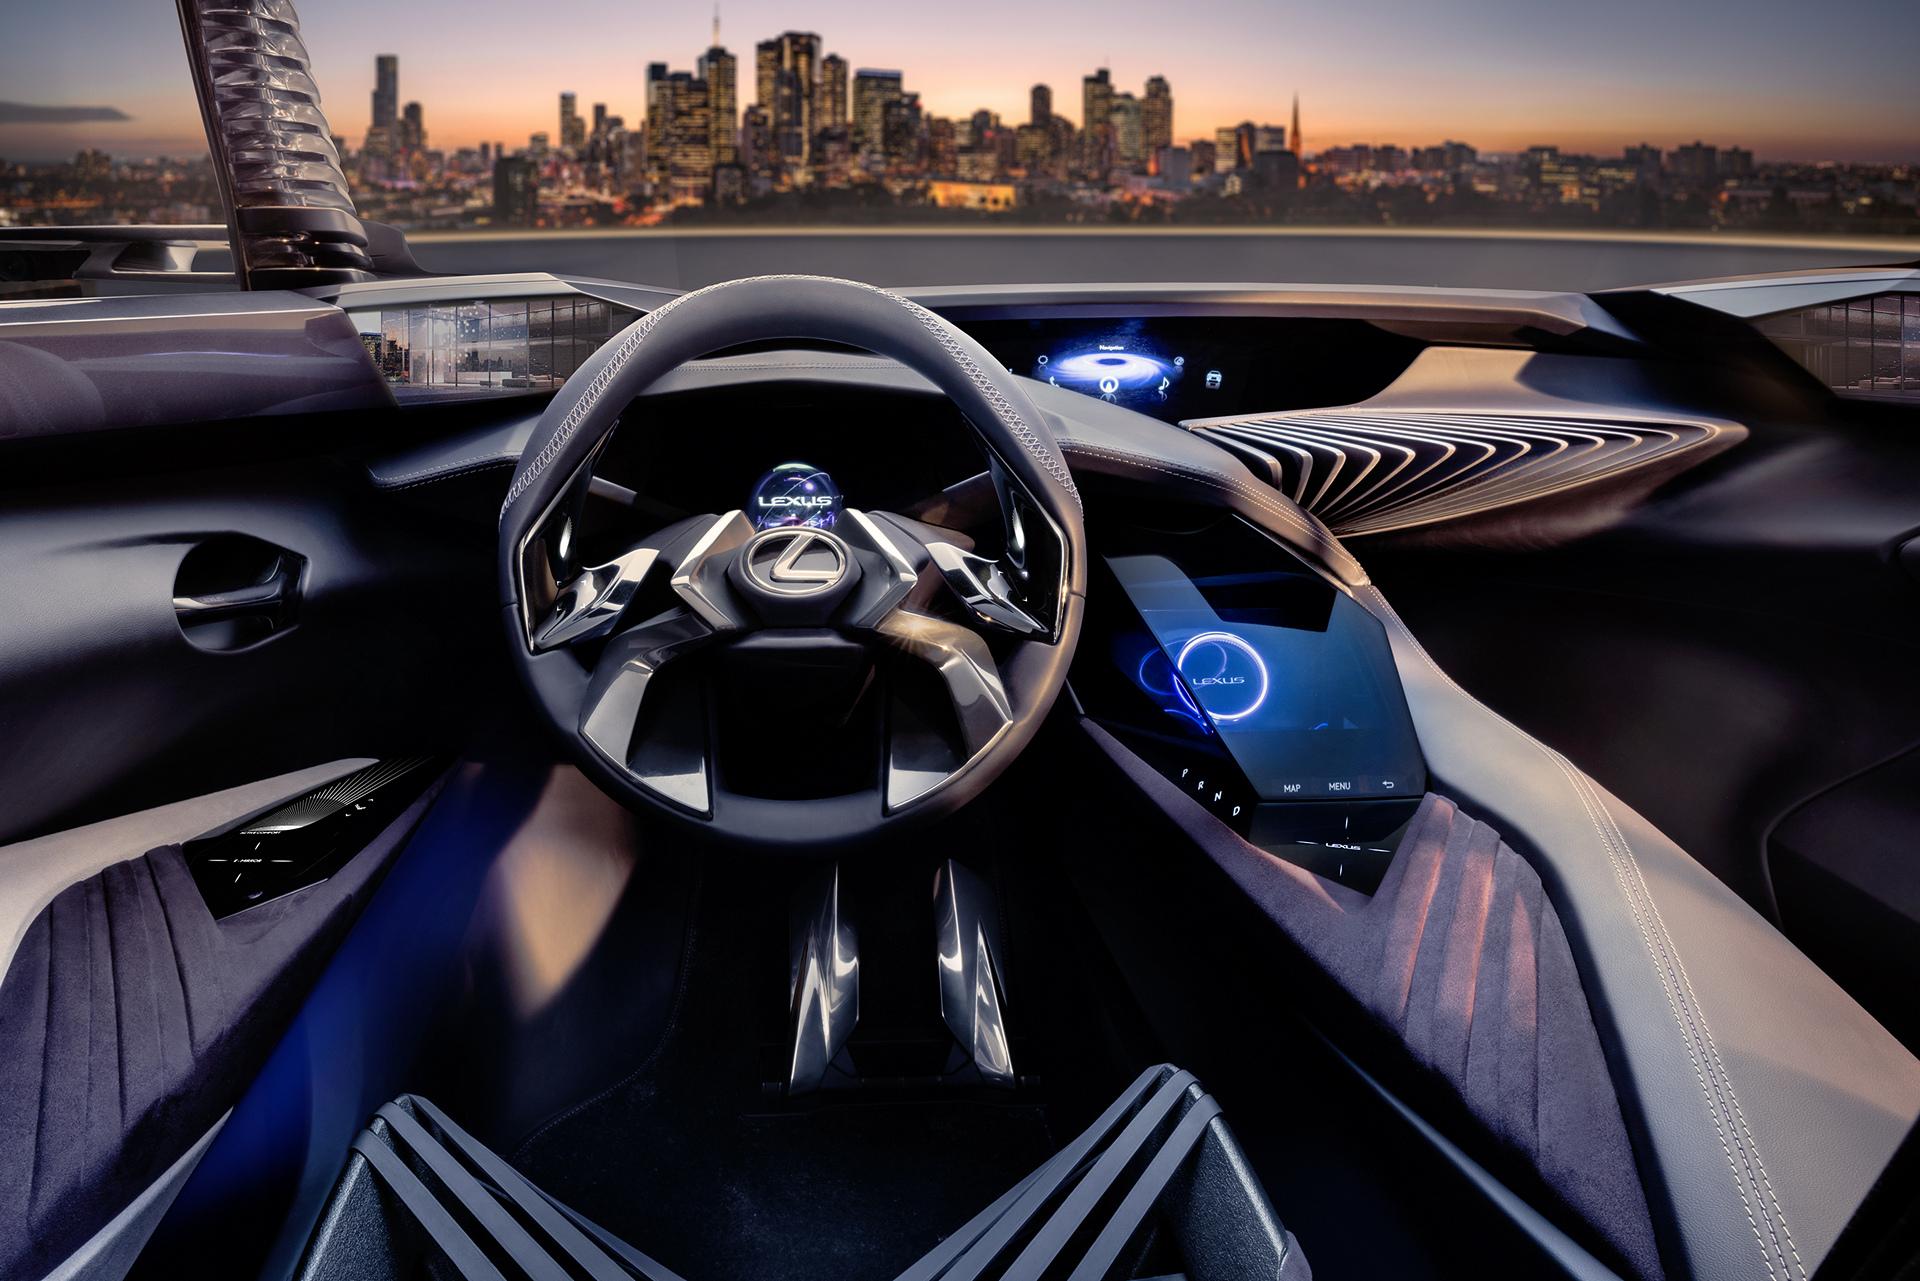 Lexus Console Concept © Toyota Motor Corporation